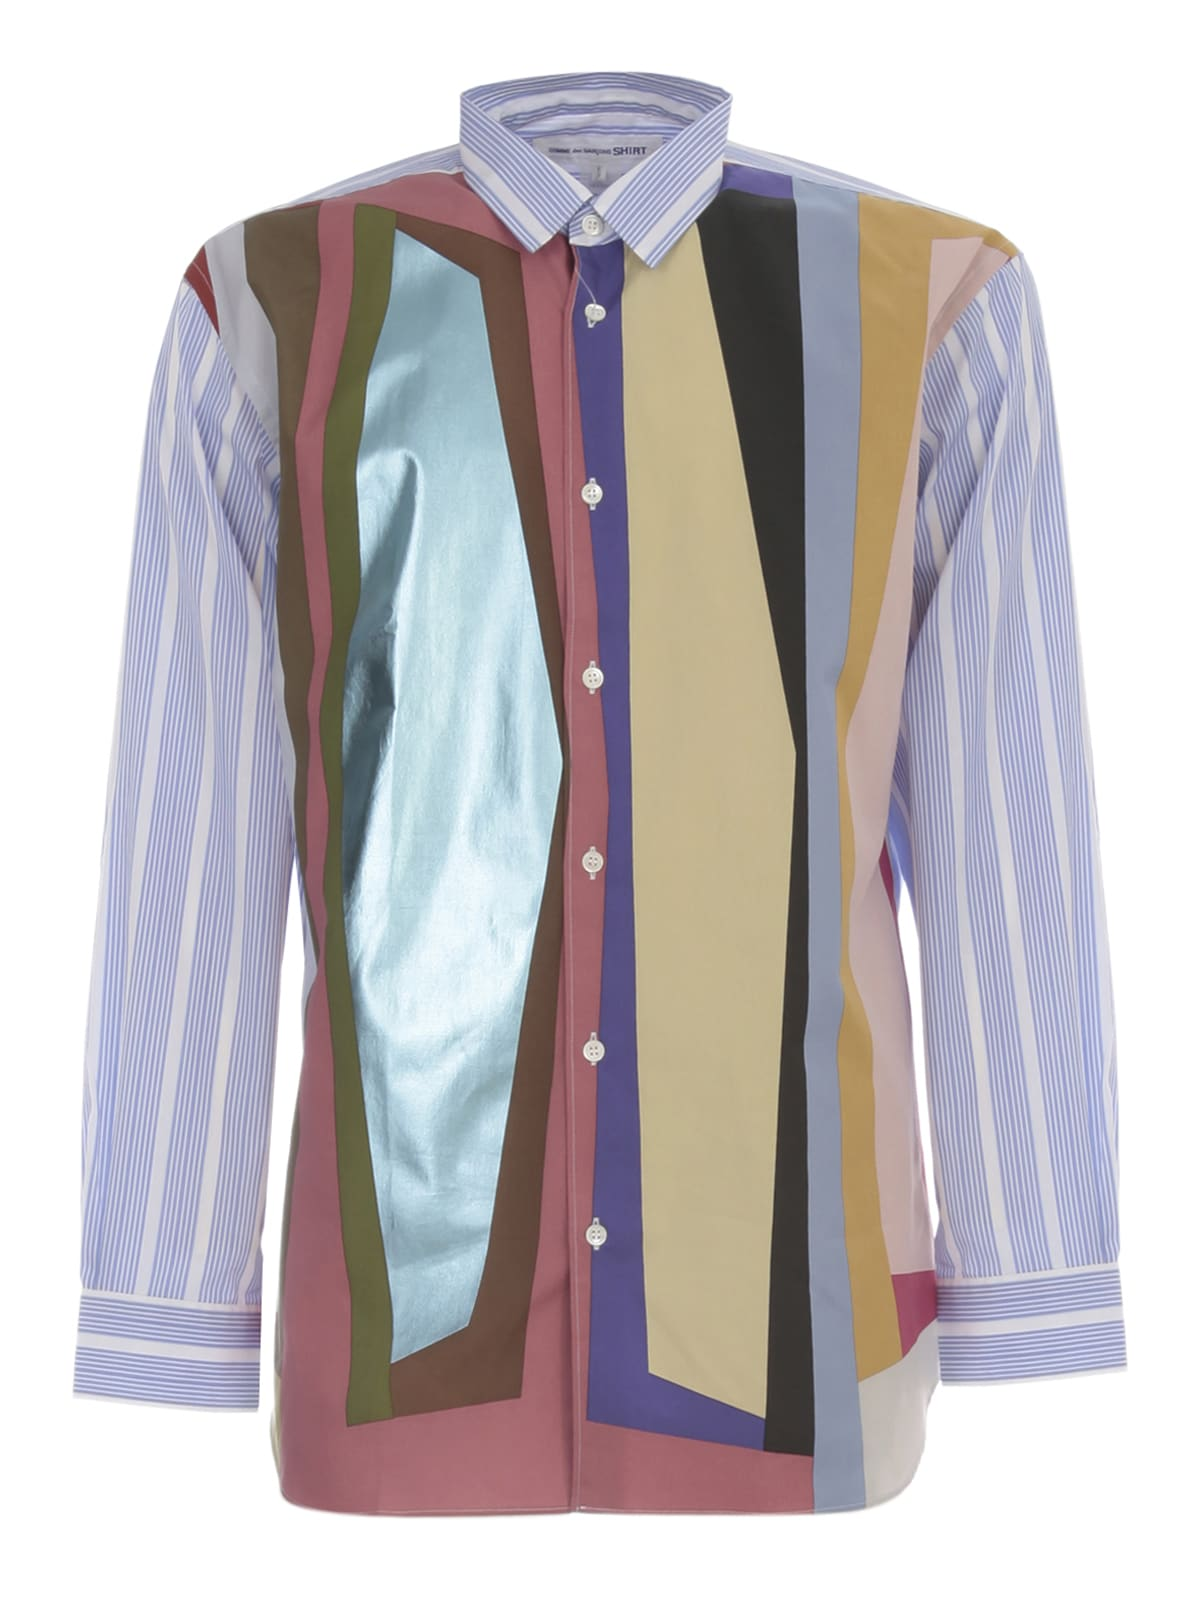 Comme des Garçons Shirt Cotton Popeline Printed Shirt